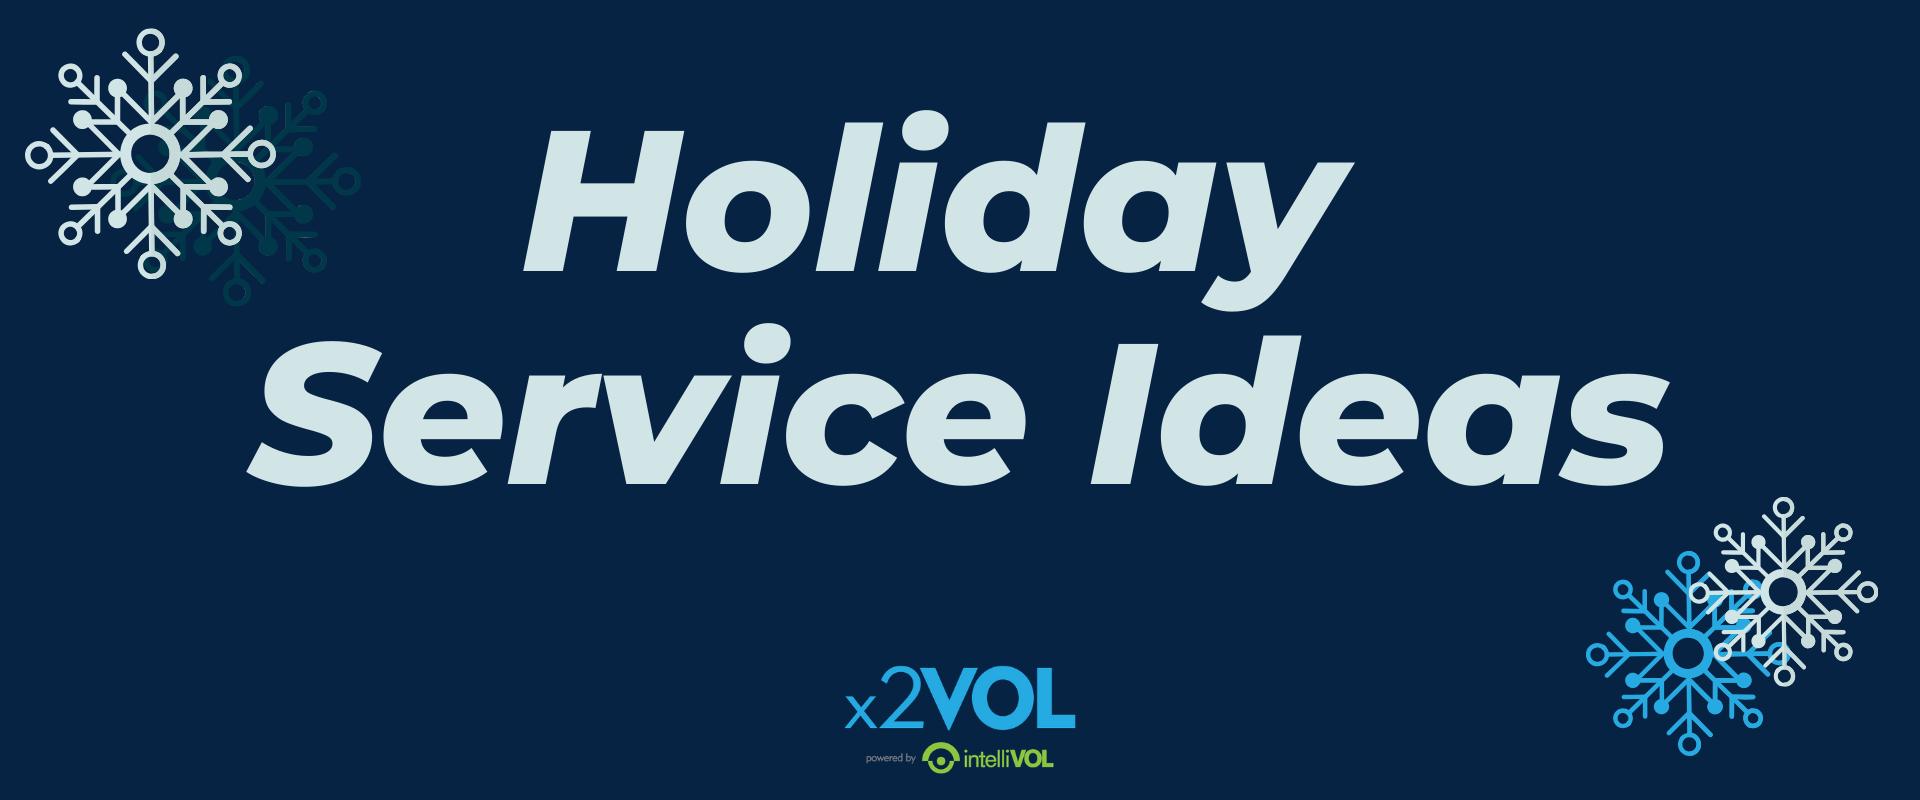 Holiday Service Ideas